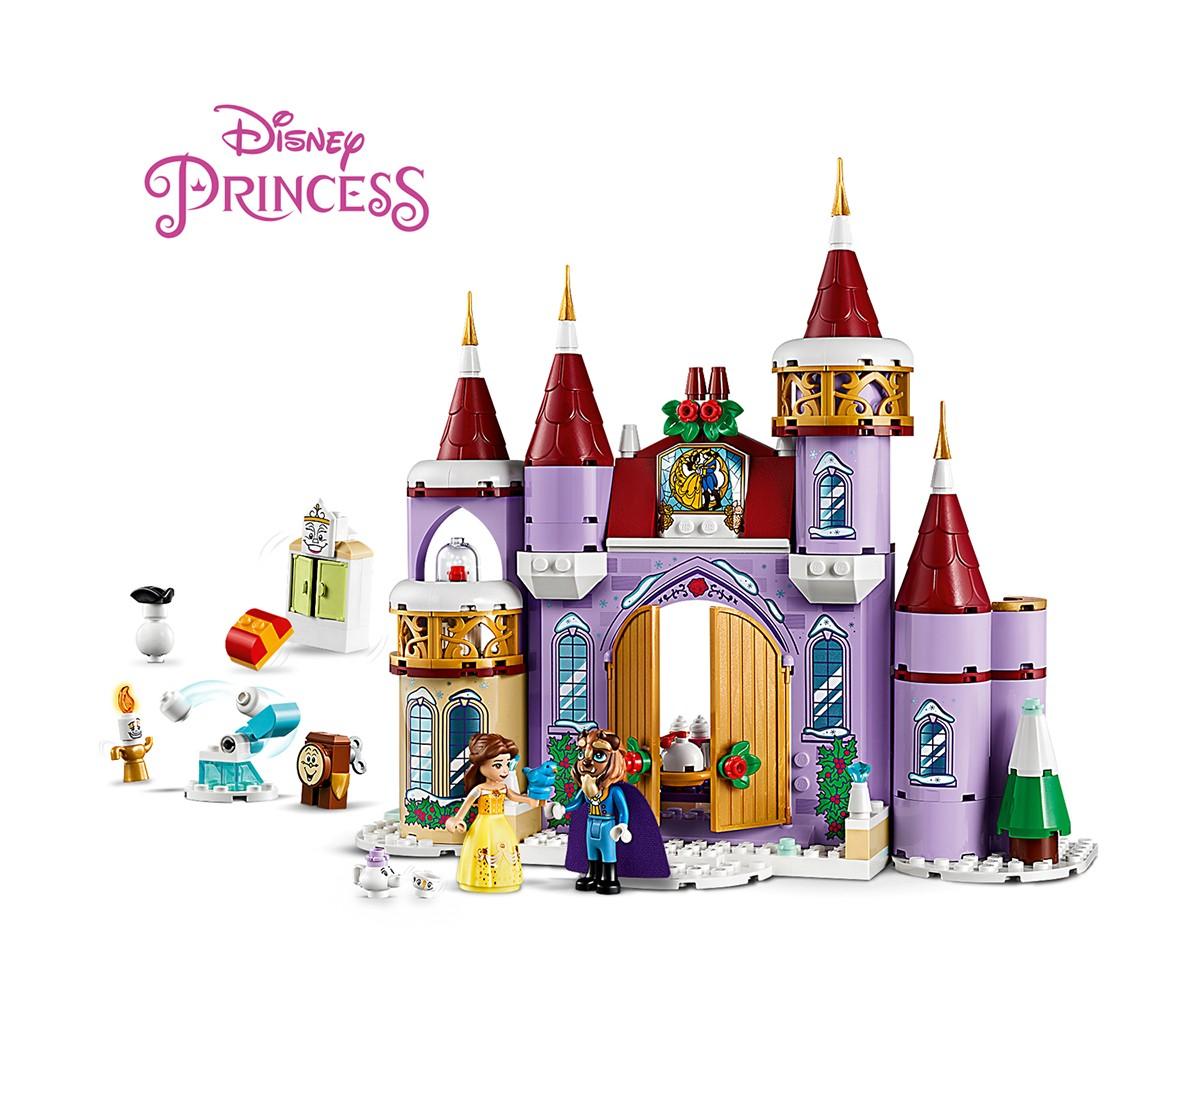 LEGO 43180 Belle's Castle Winter Celebration Lego Blocks for Girls age 4Y+